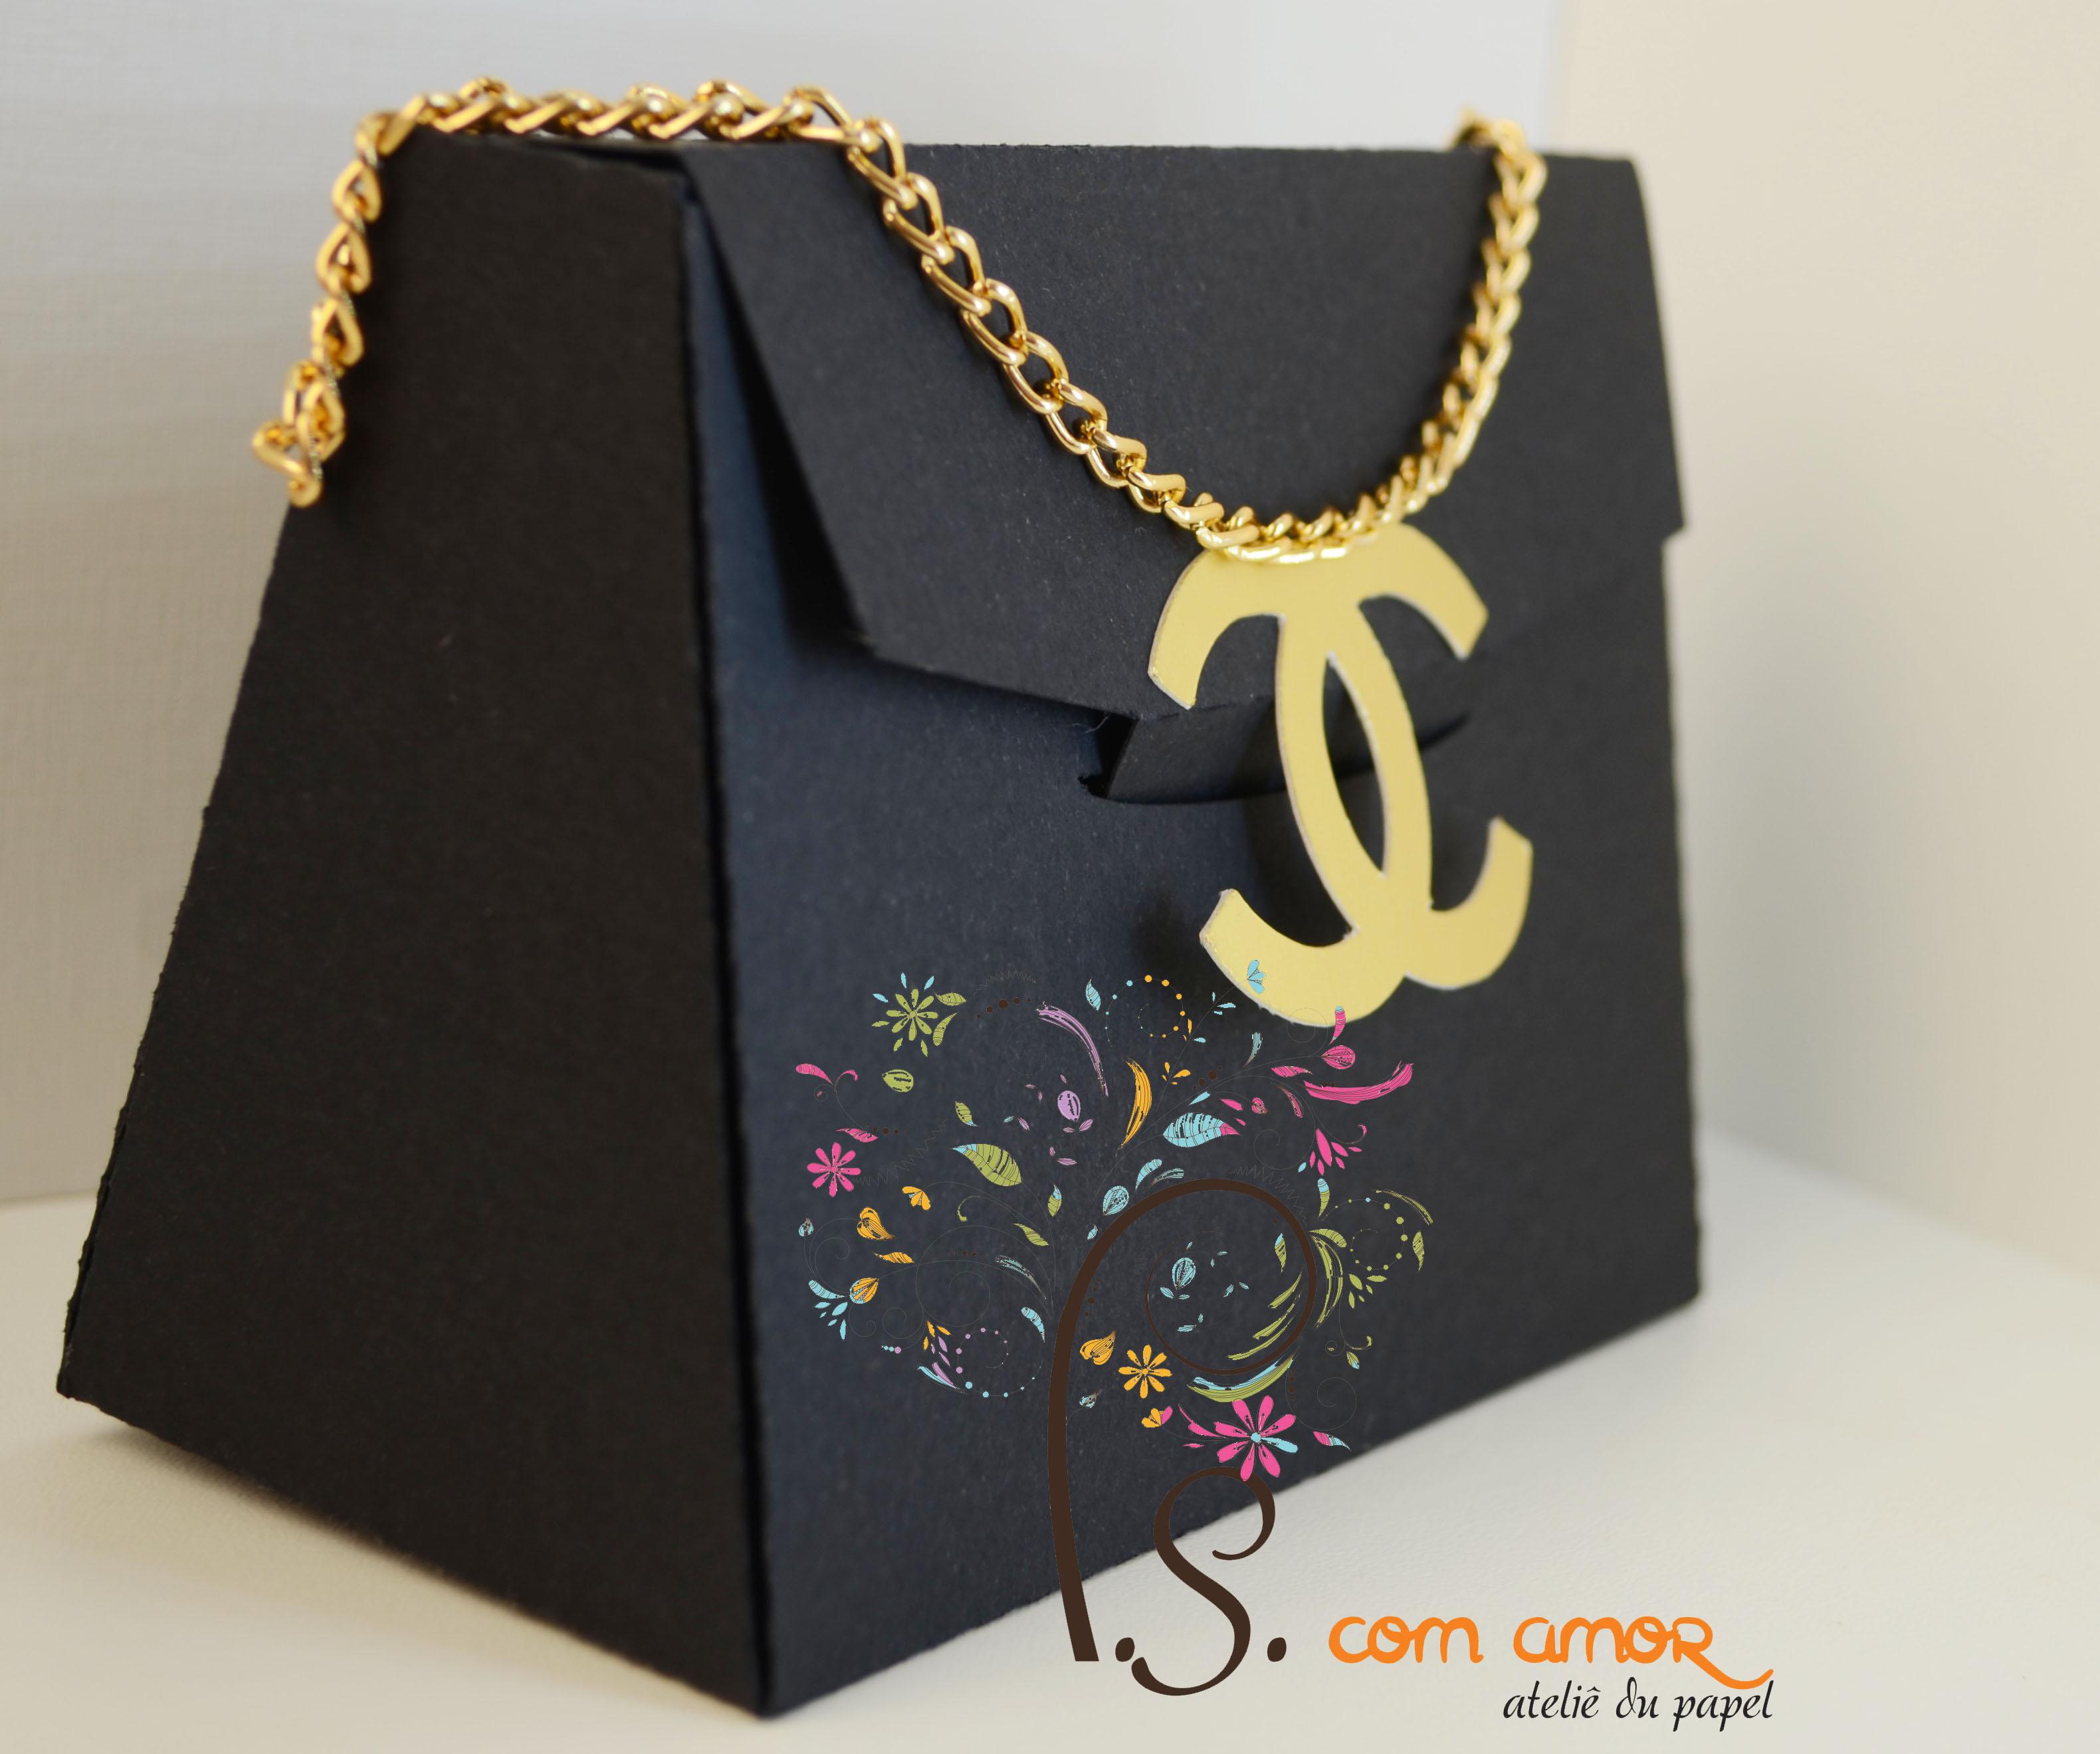 Bolsa Chanel no Elo7   P S Com Amor (595762) 8b343ccbcd